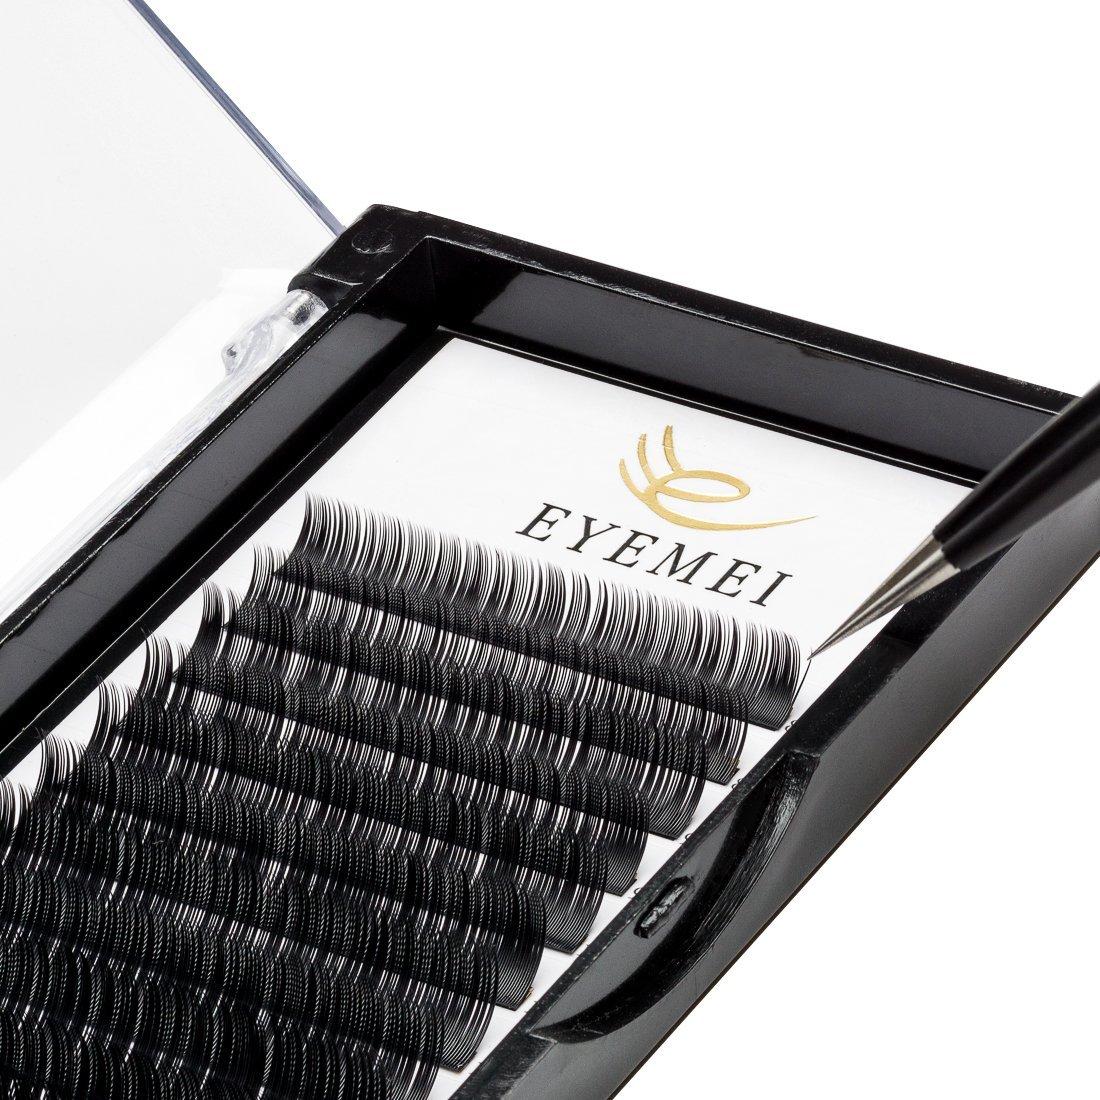 9a63ff787f9 Get Quotations · Eyelash Extensions C Curl 0.20 12mm Natural Soft Faux Mink  Single Eyelash Extensions Individual False Eyelashes